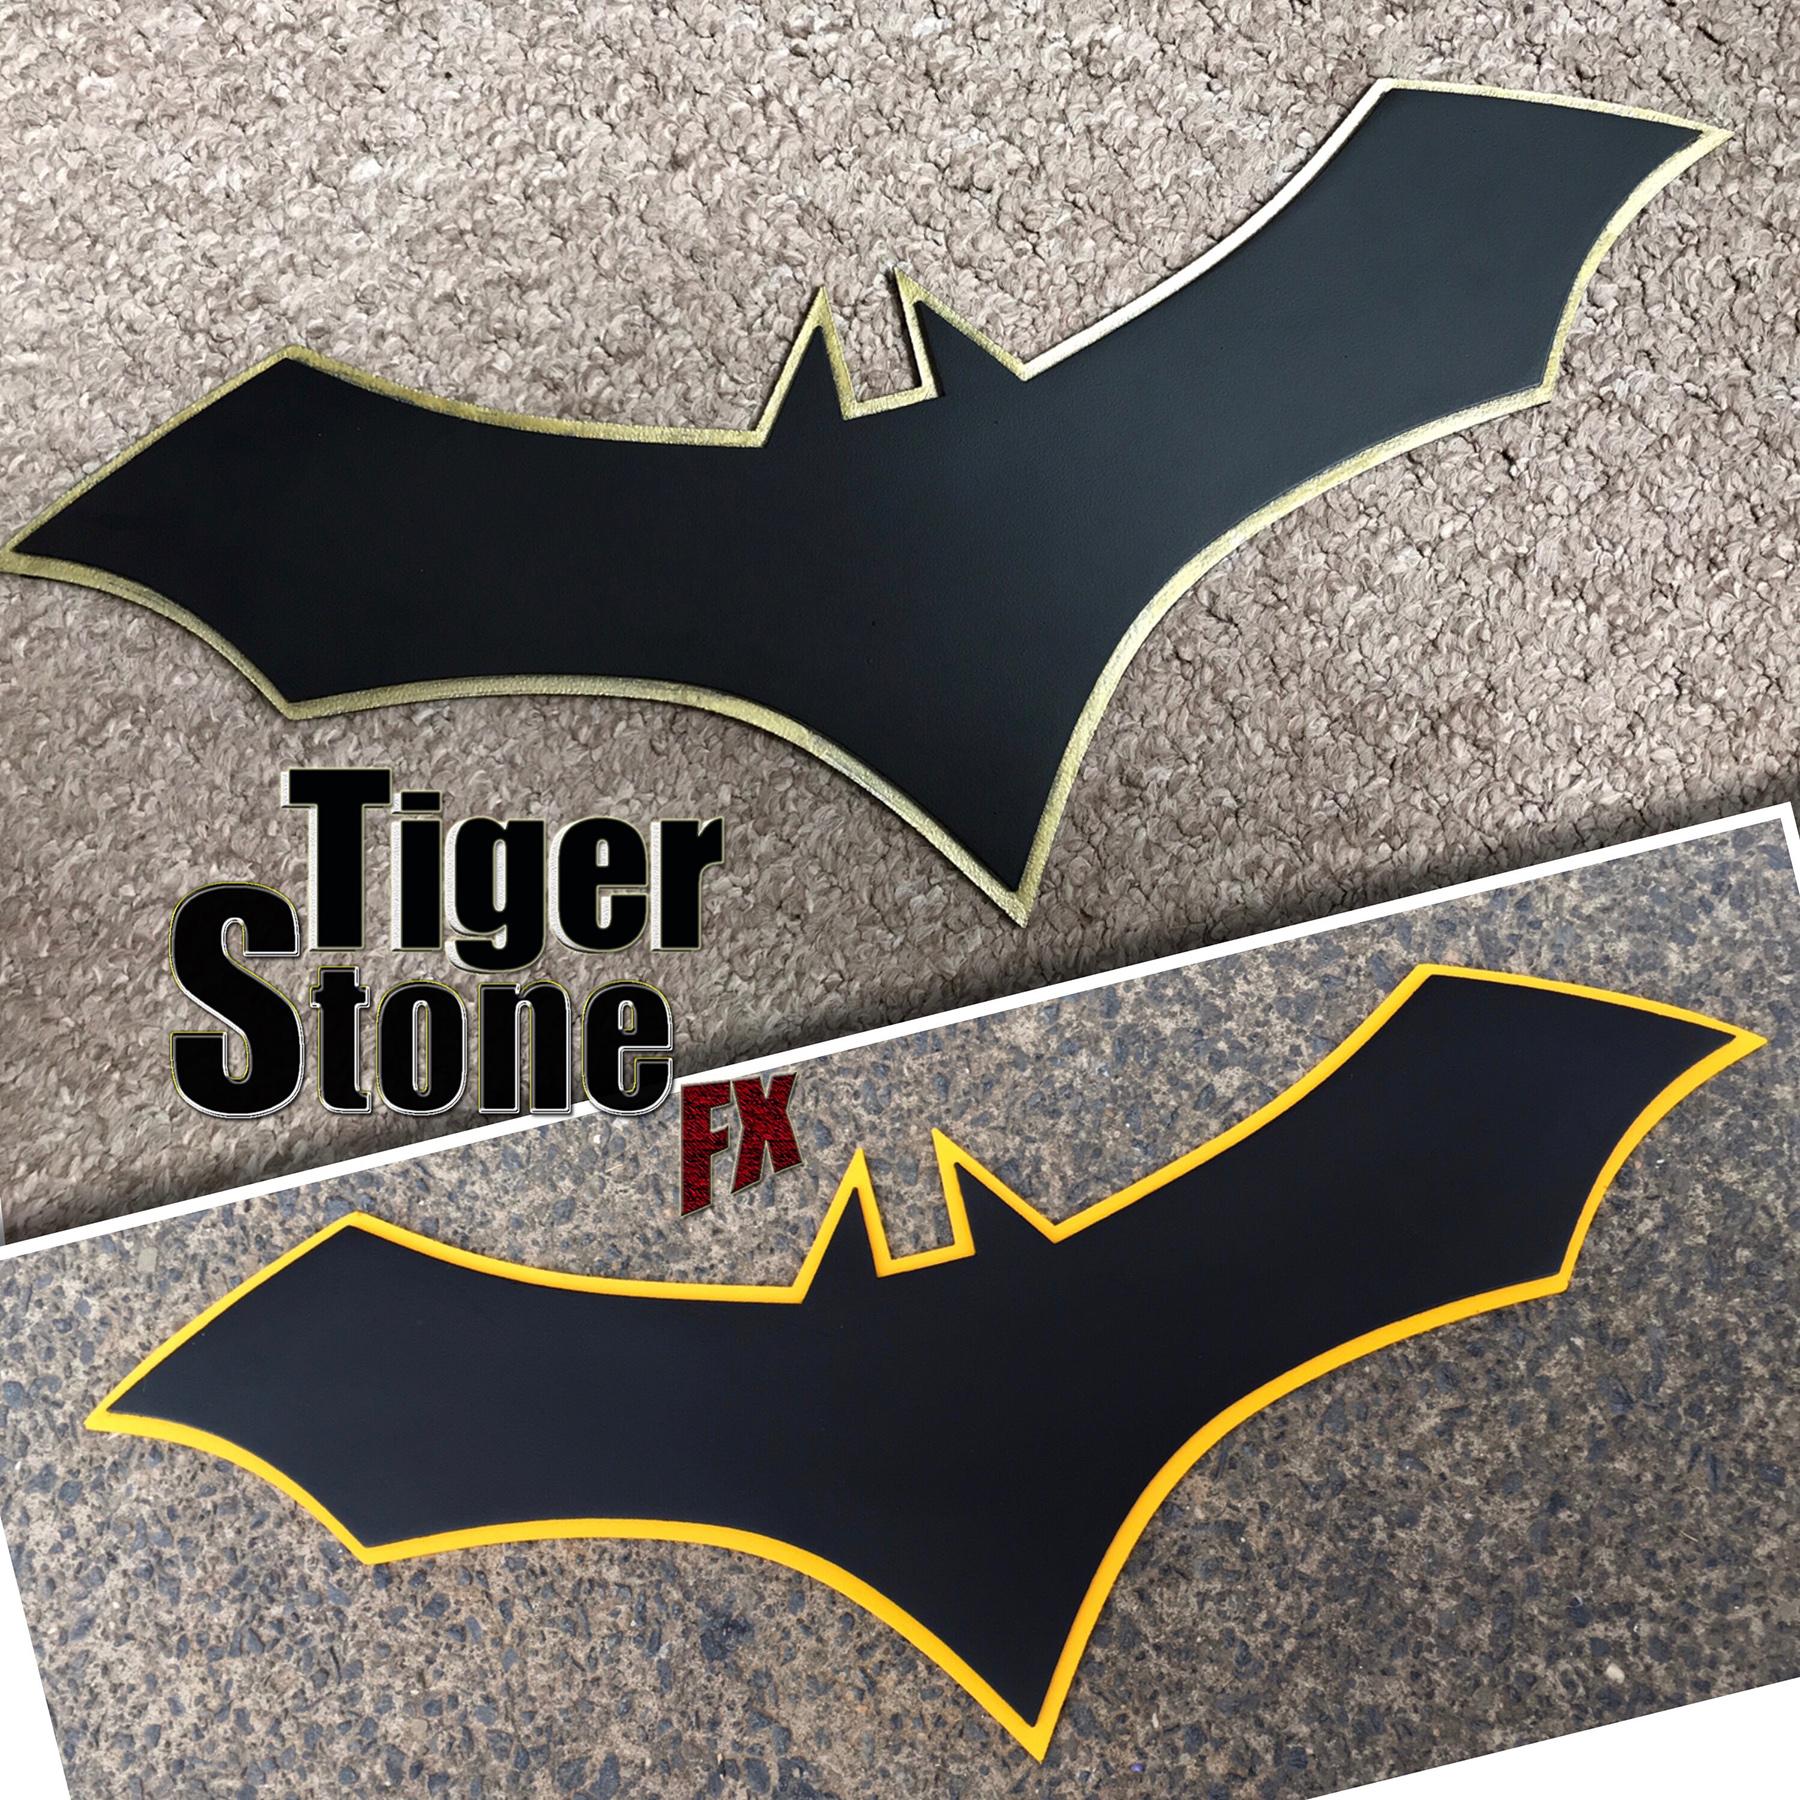 Batman Rebirth Comics Inspired Tiger Stone Fx